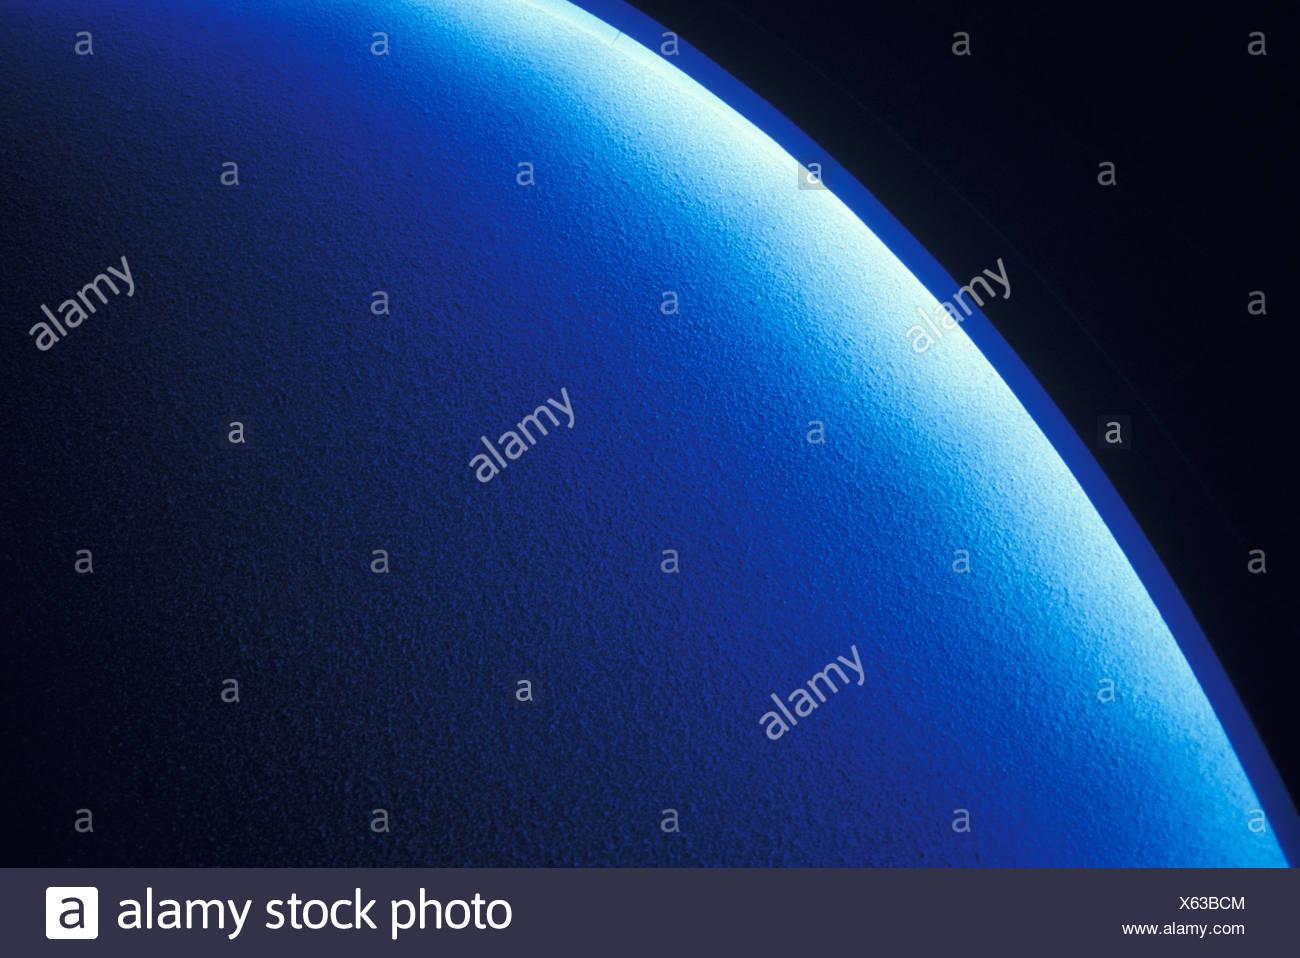 Blue material, long exposure - Stock Image